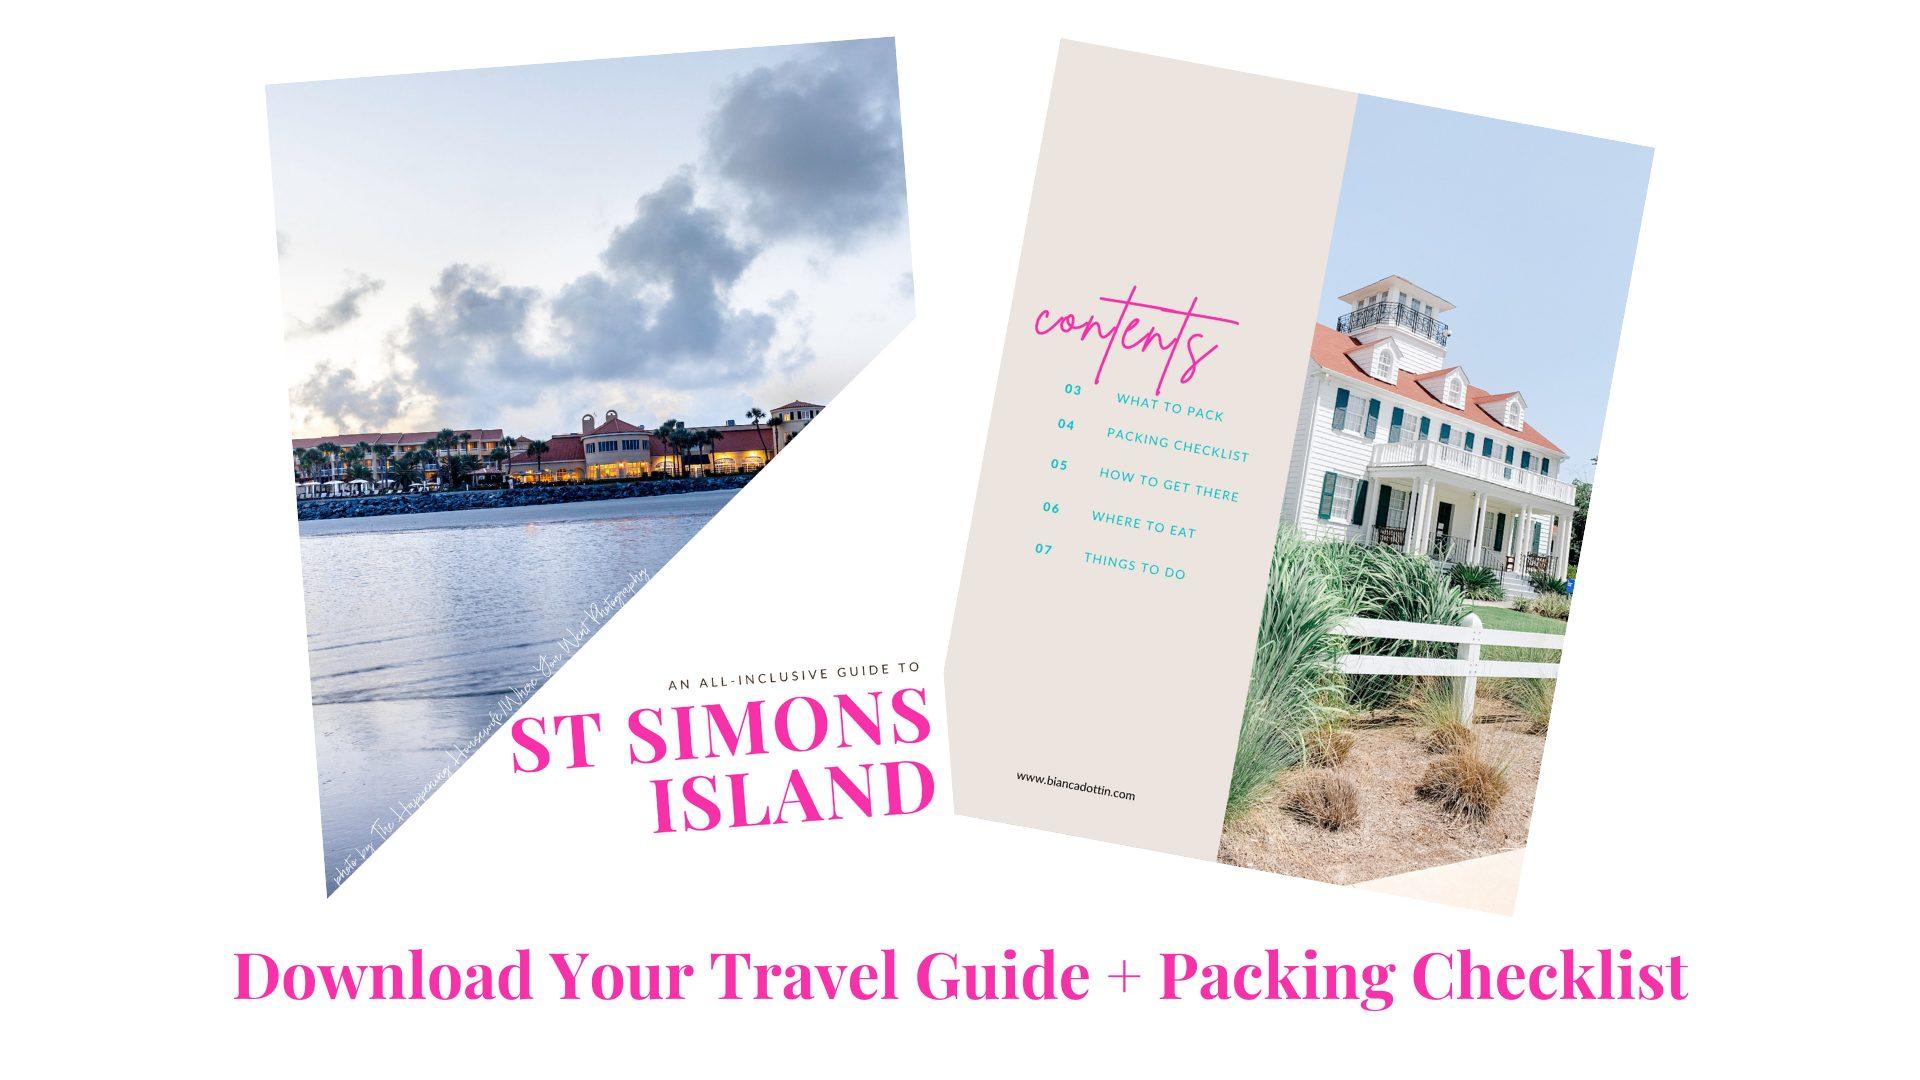 St Simons Island Travel Guide